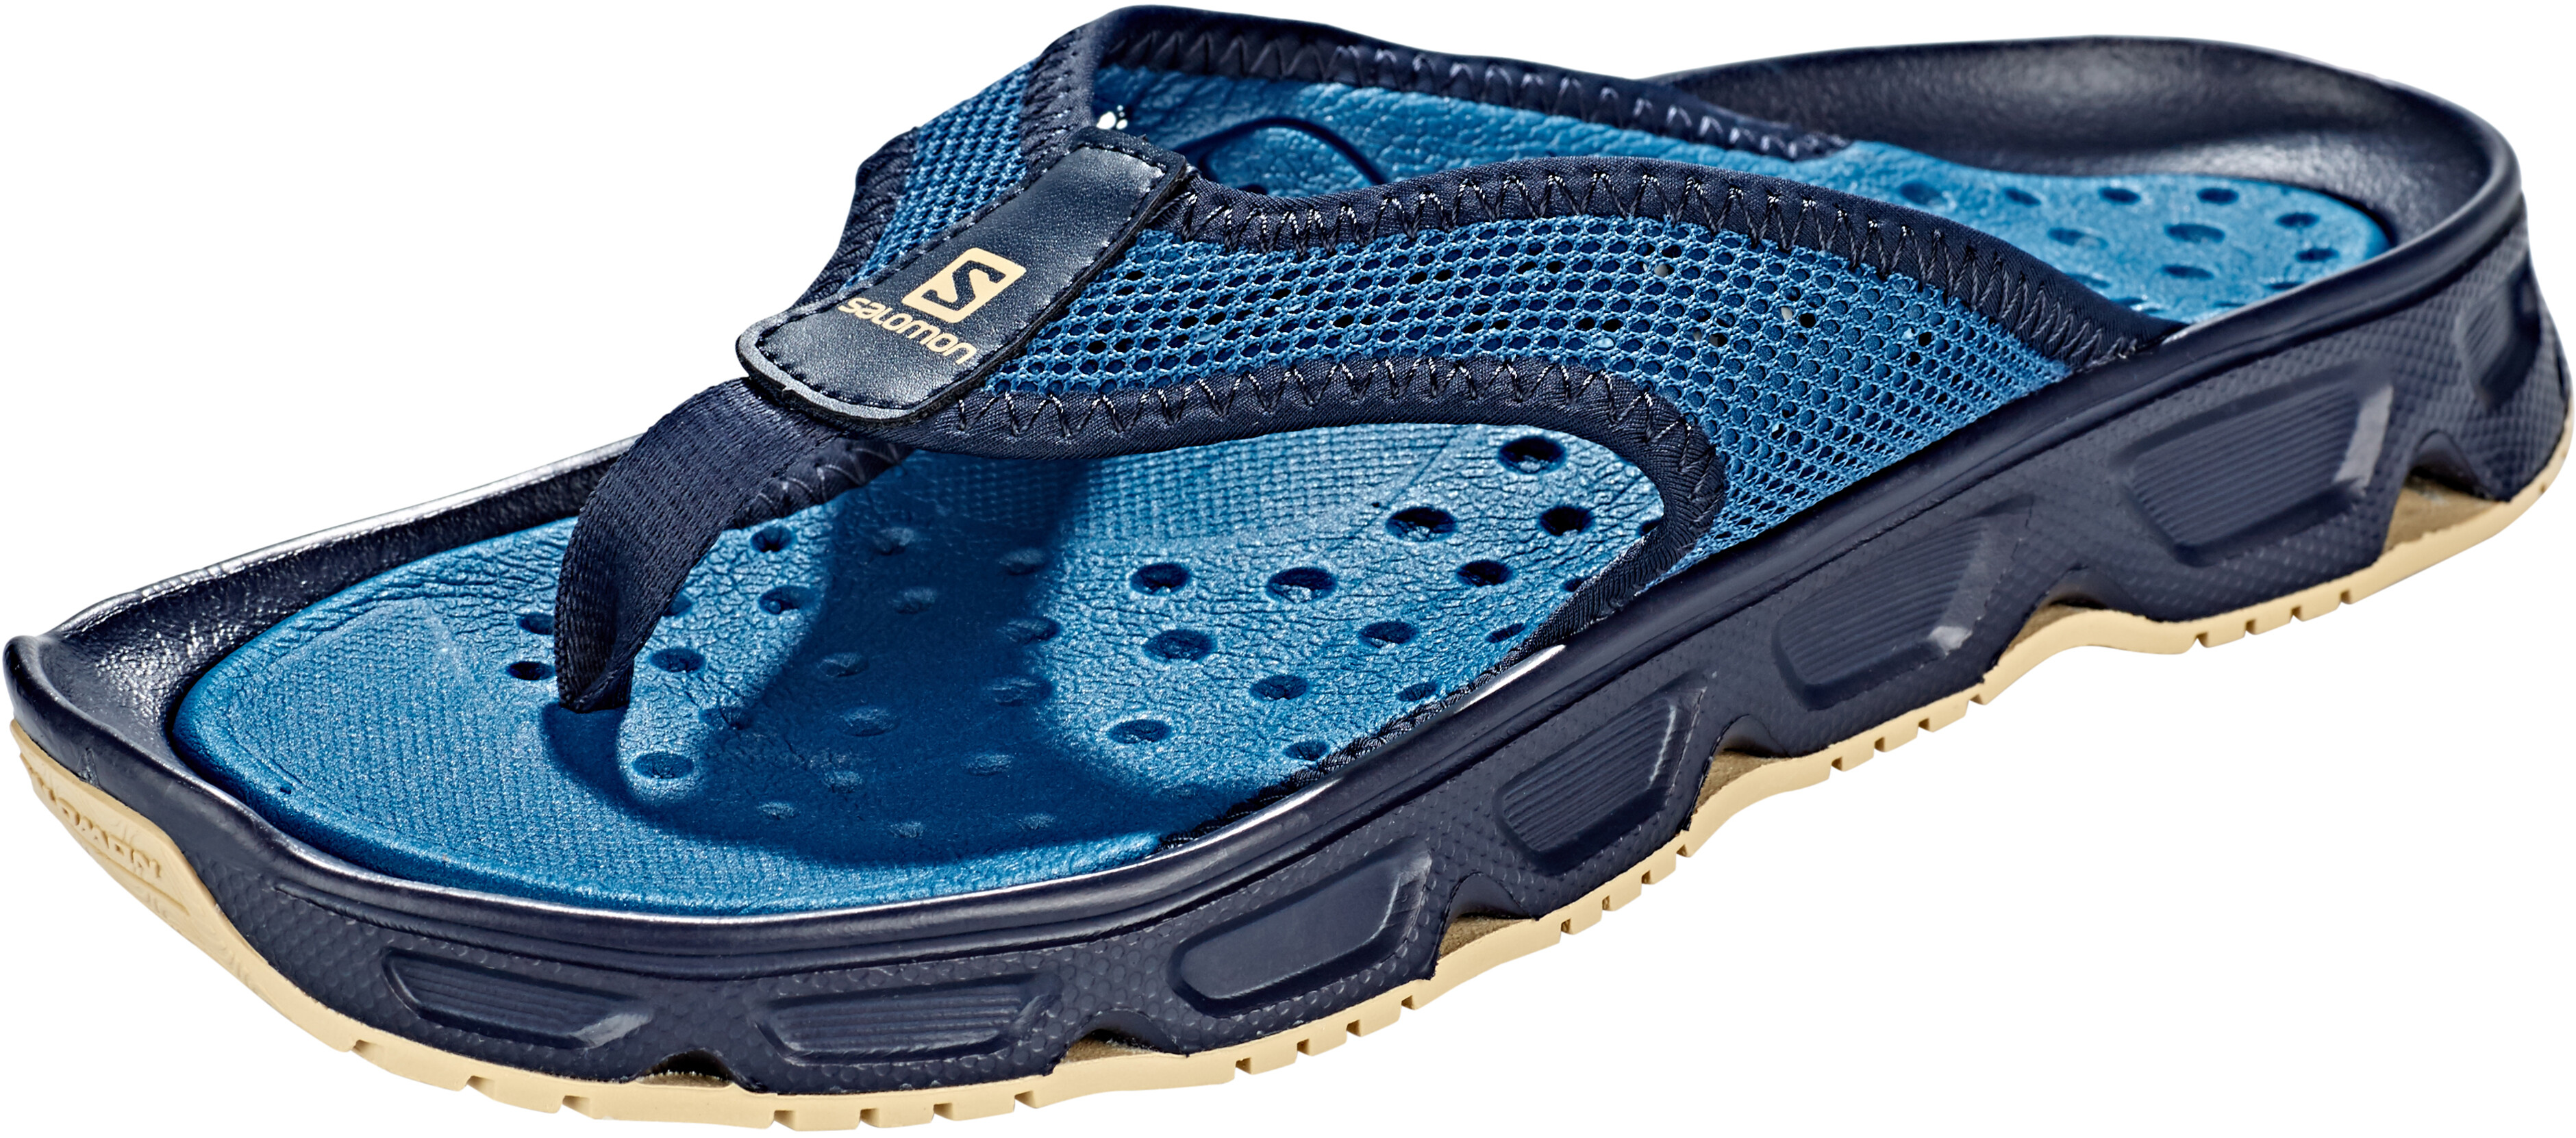 b7a841a95ff1a6 Salomon RX Break 4.0 Running Shoes Men blue at Bikester.co.uk